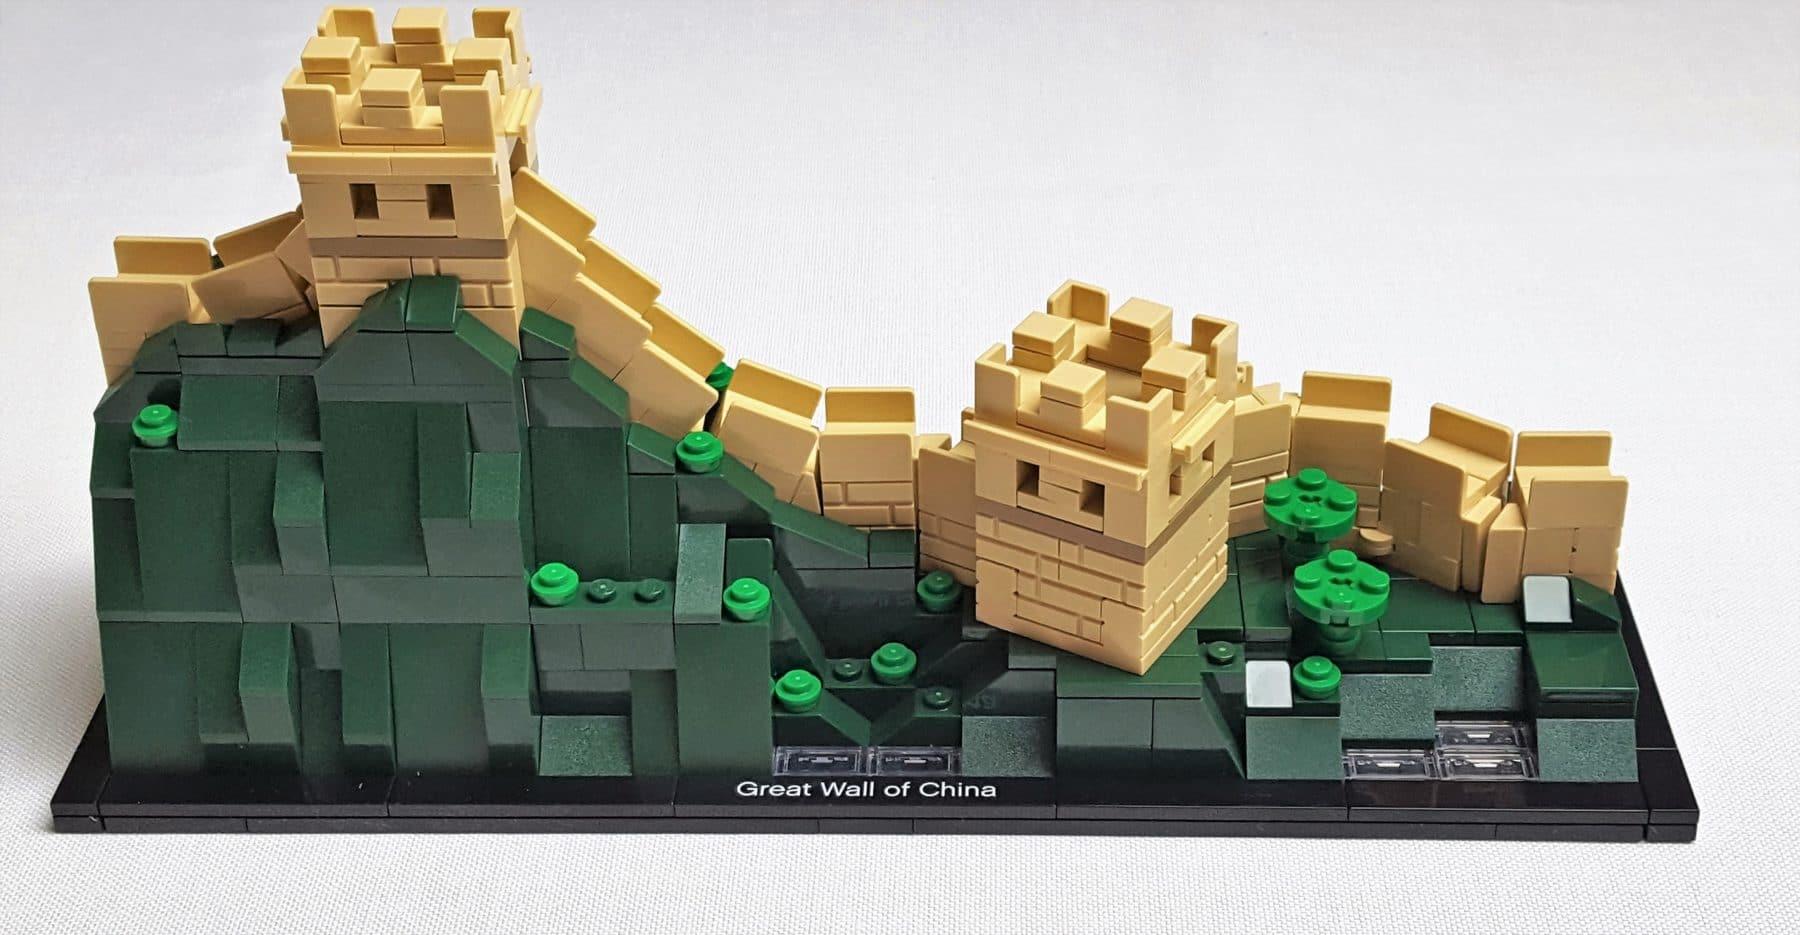 Review Chinesische Mauer